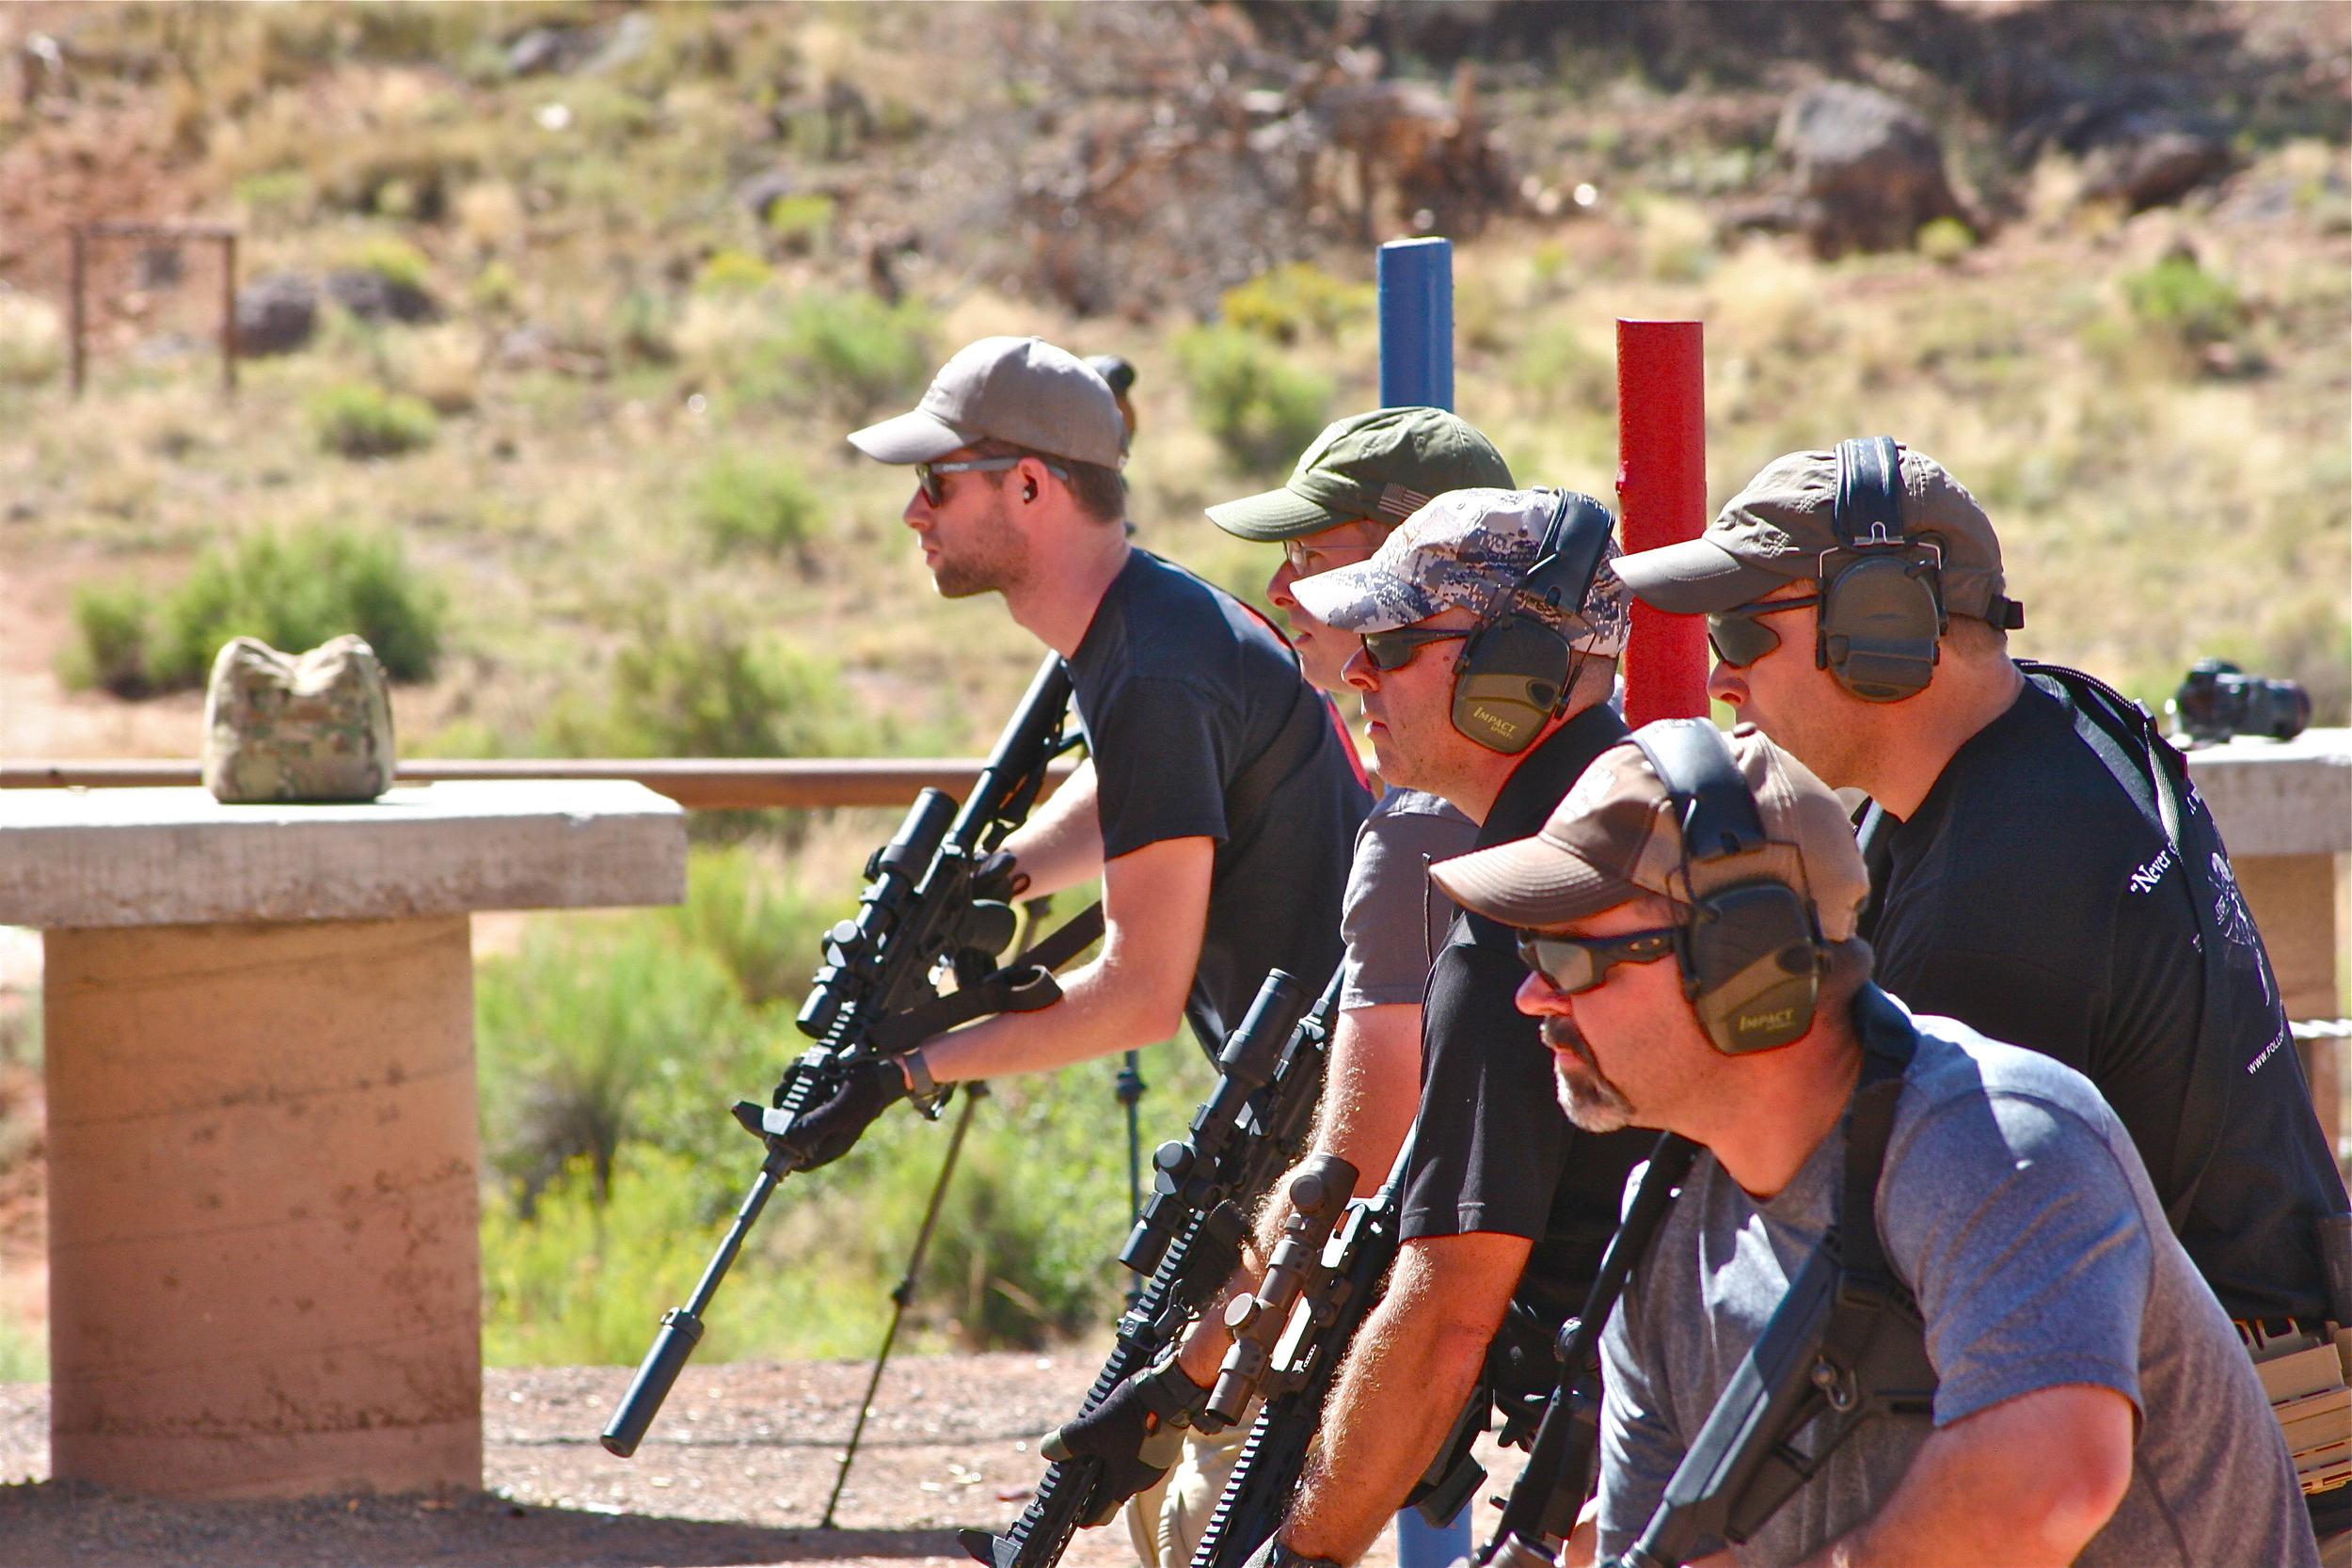 Firearms Training & Instruction: Scoped Carbine Course, Utah, Rifle, AR